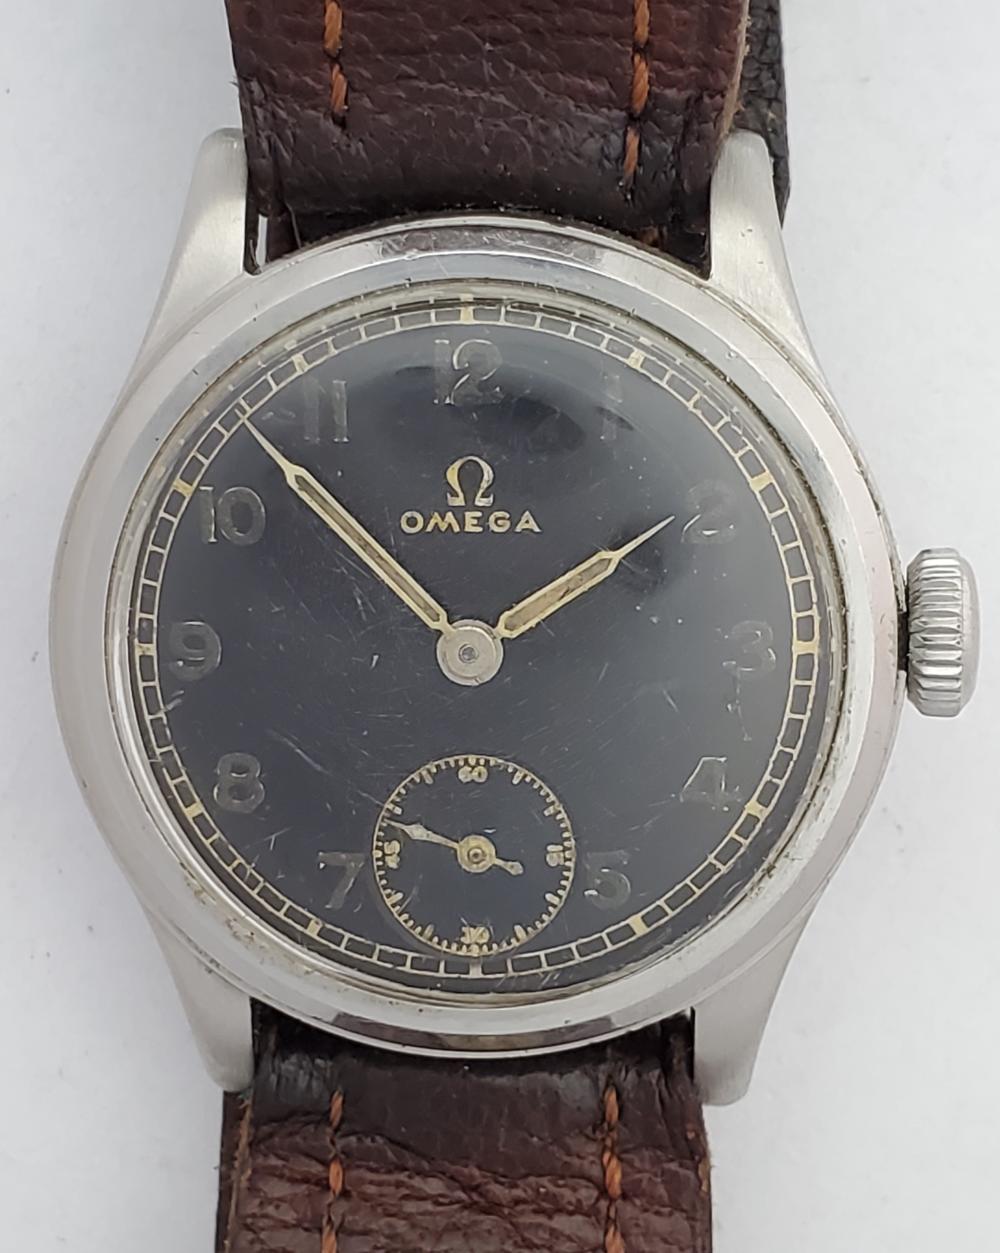 Scarce Omega Dienstuhr Black Dial 24h Military Wrist Watch